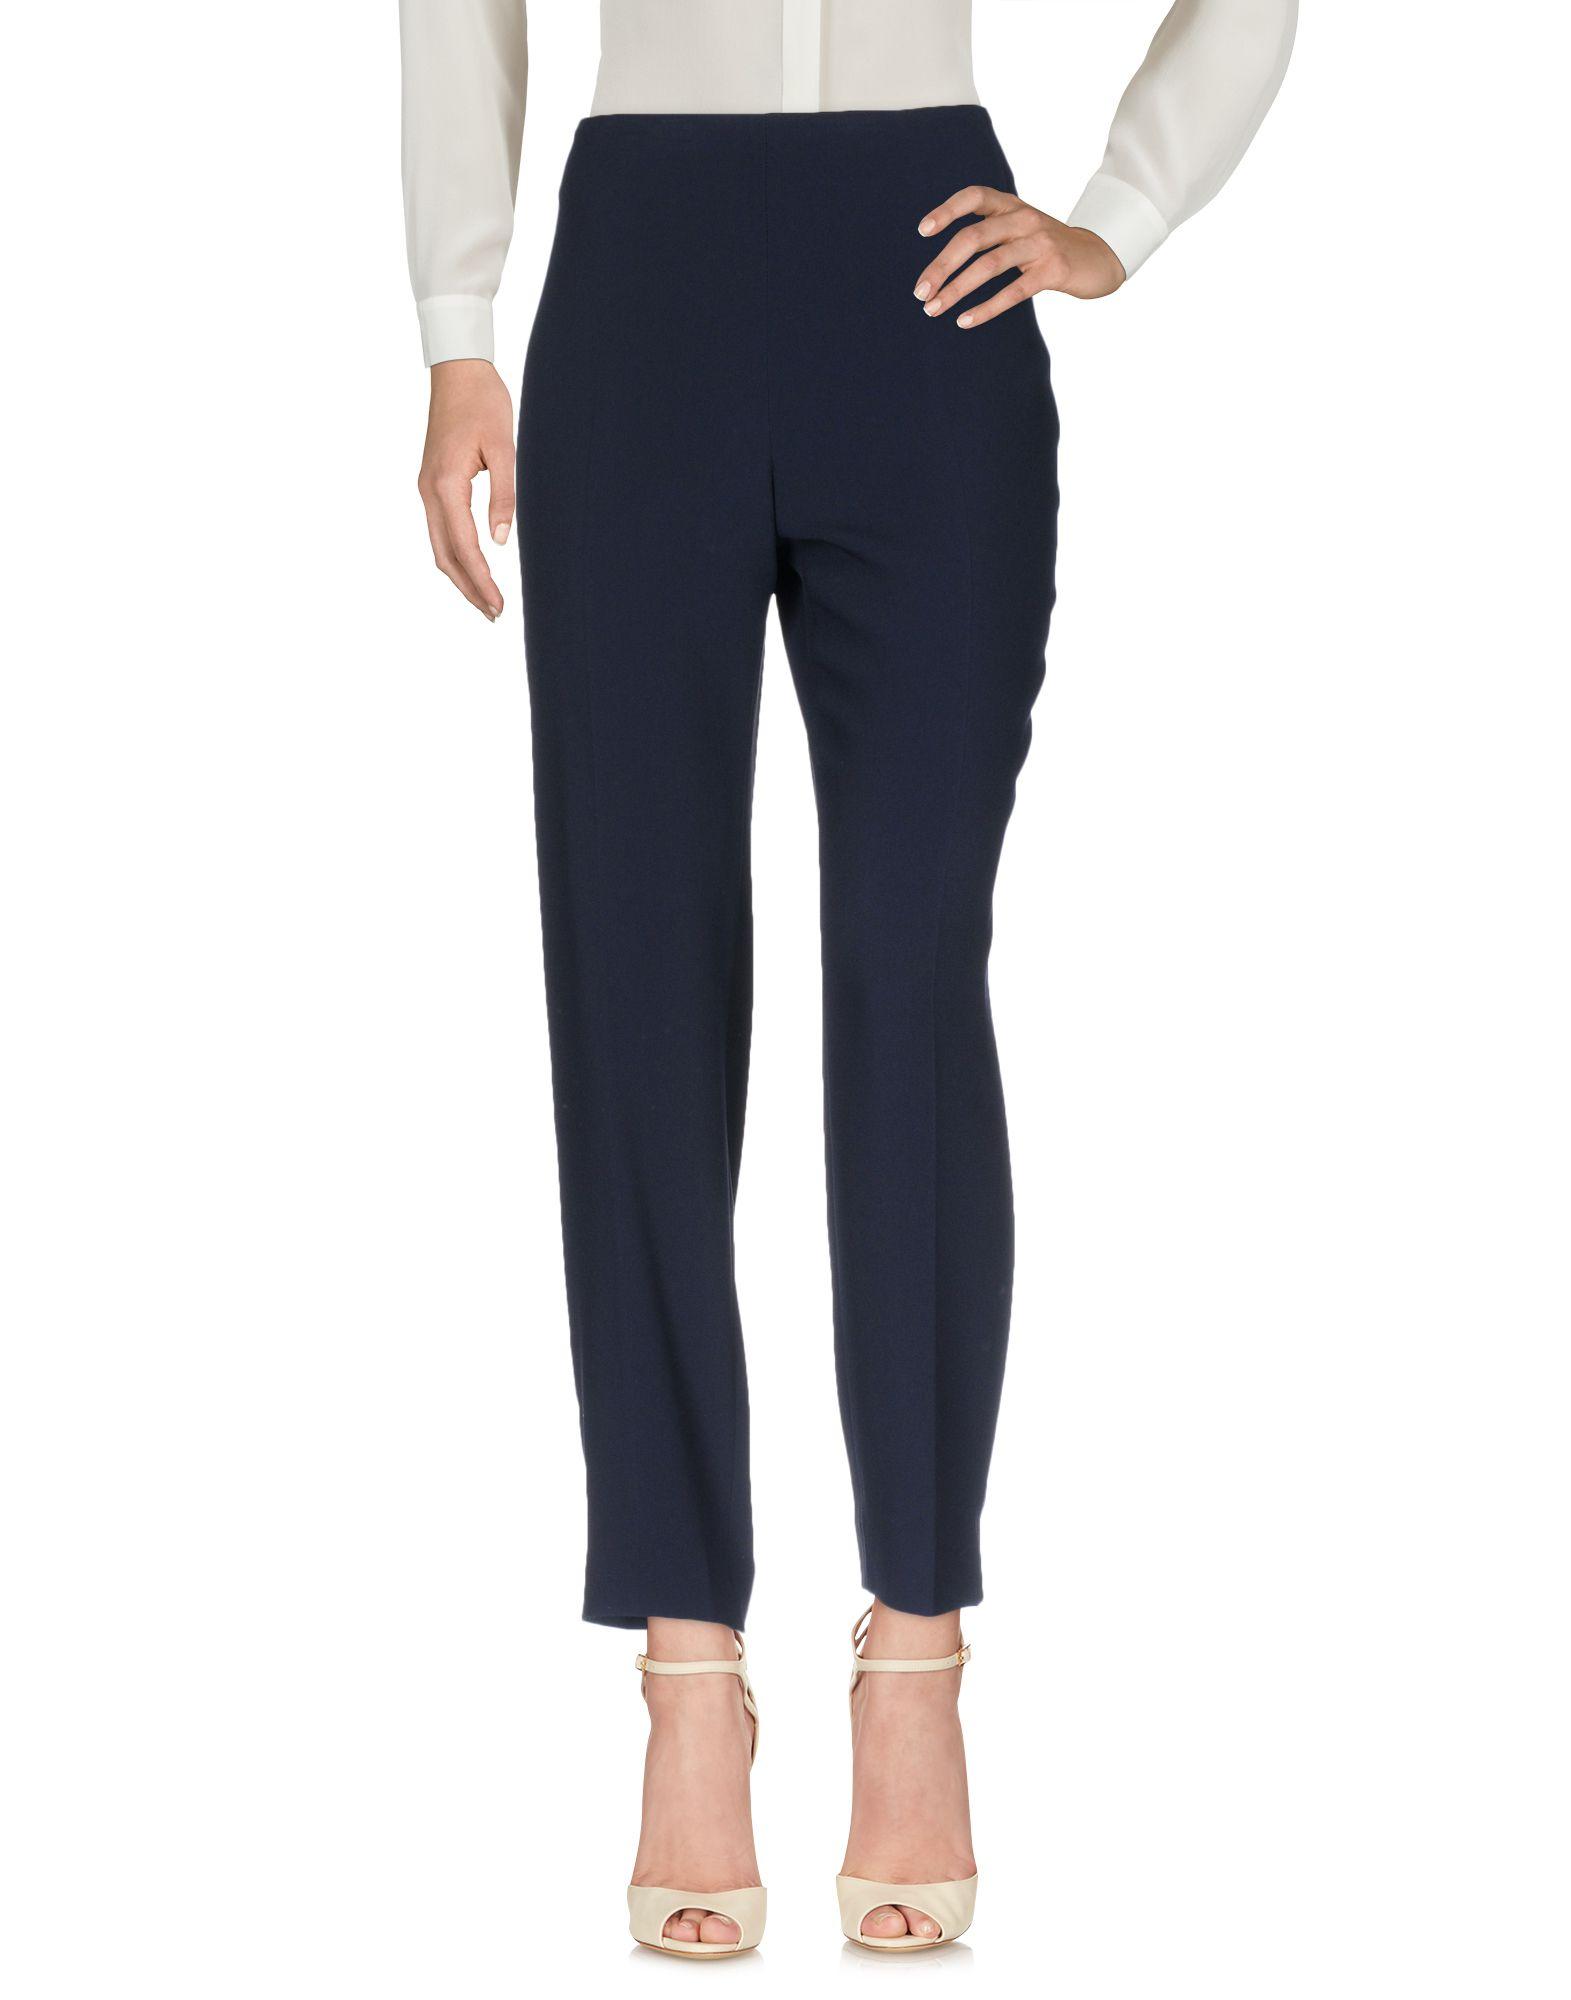 Les Pantalons - 3/4 Pantalon De Longueur Giorgio Grati ENFNLivrY7